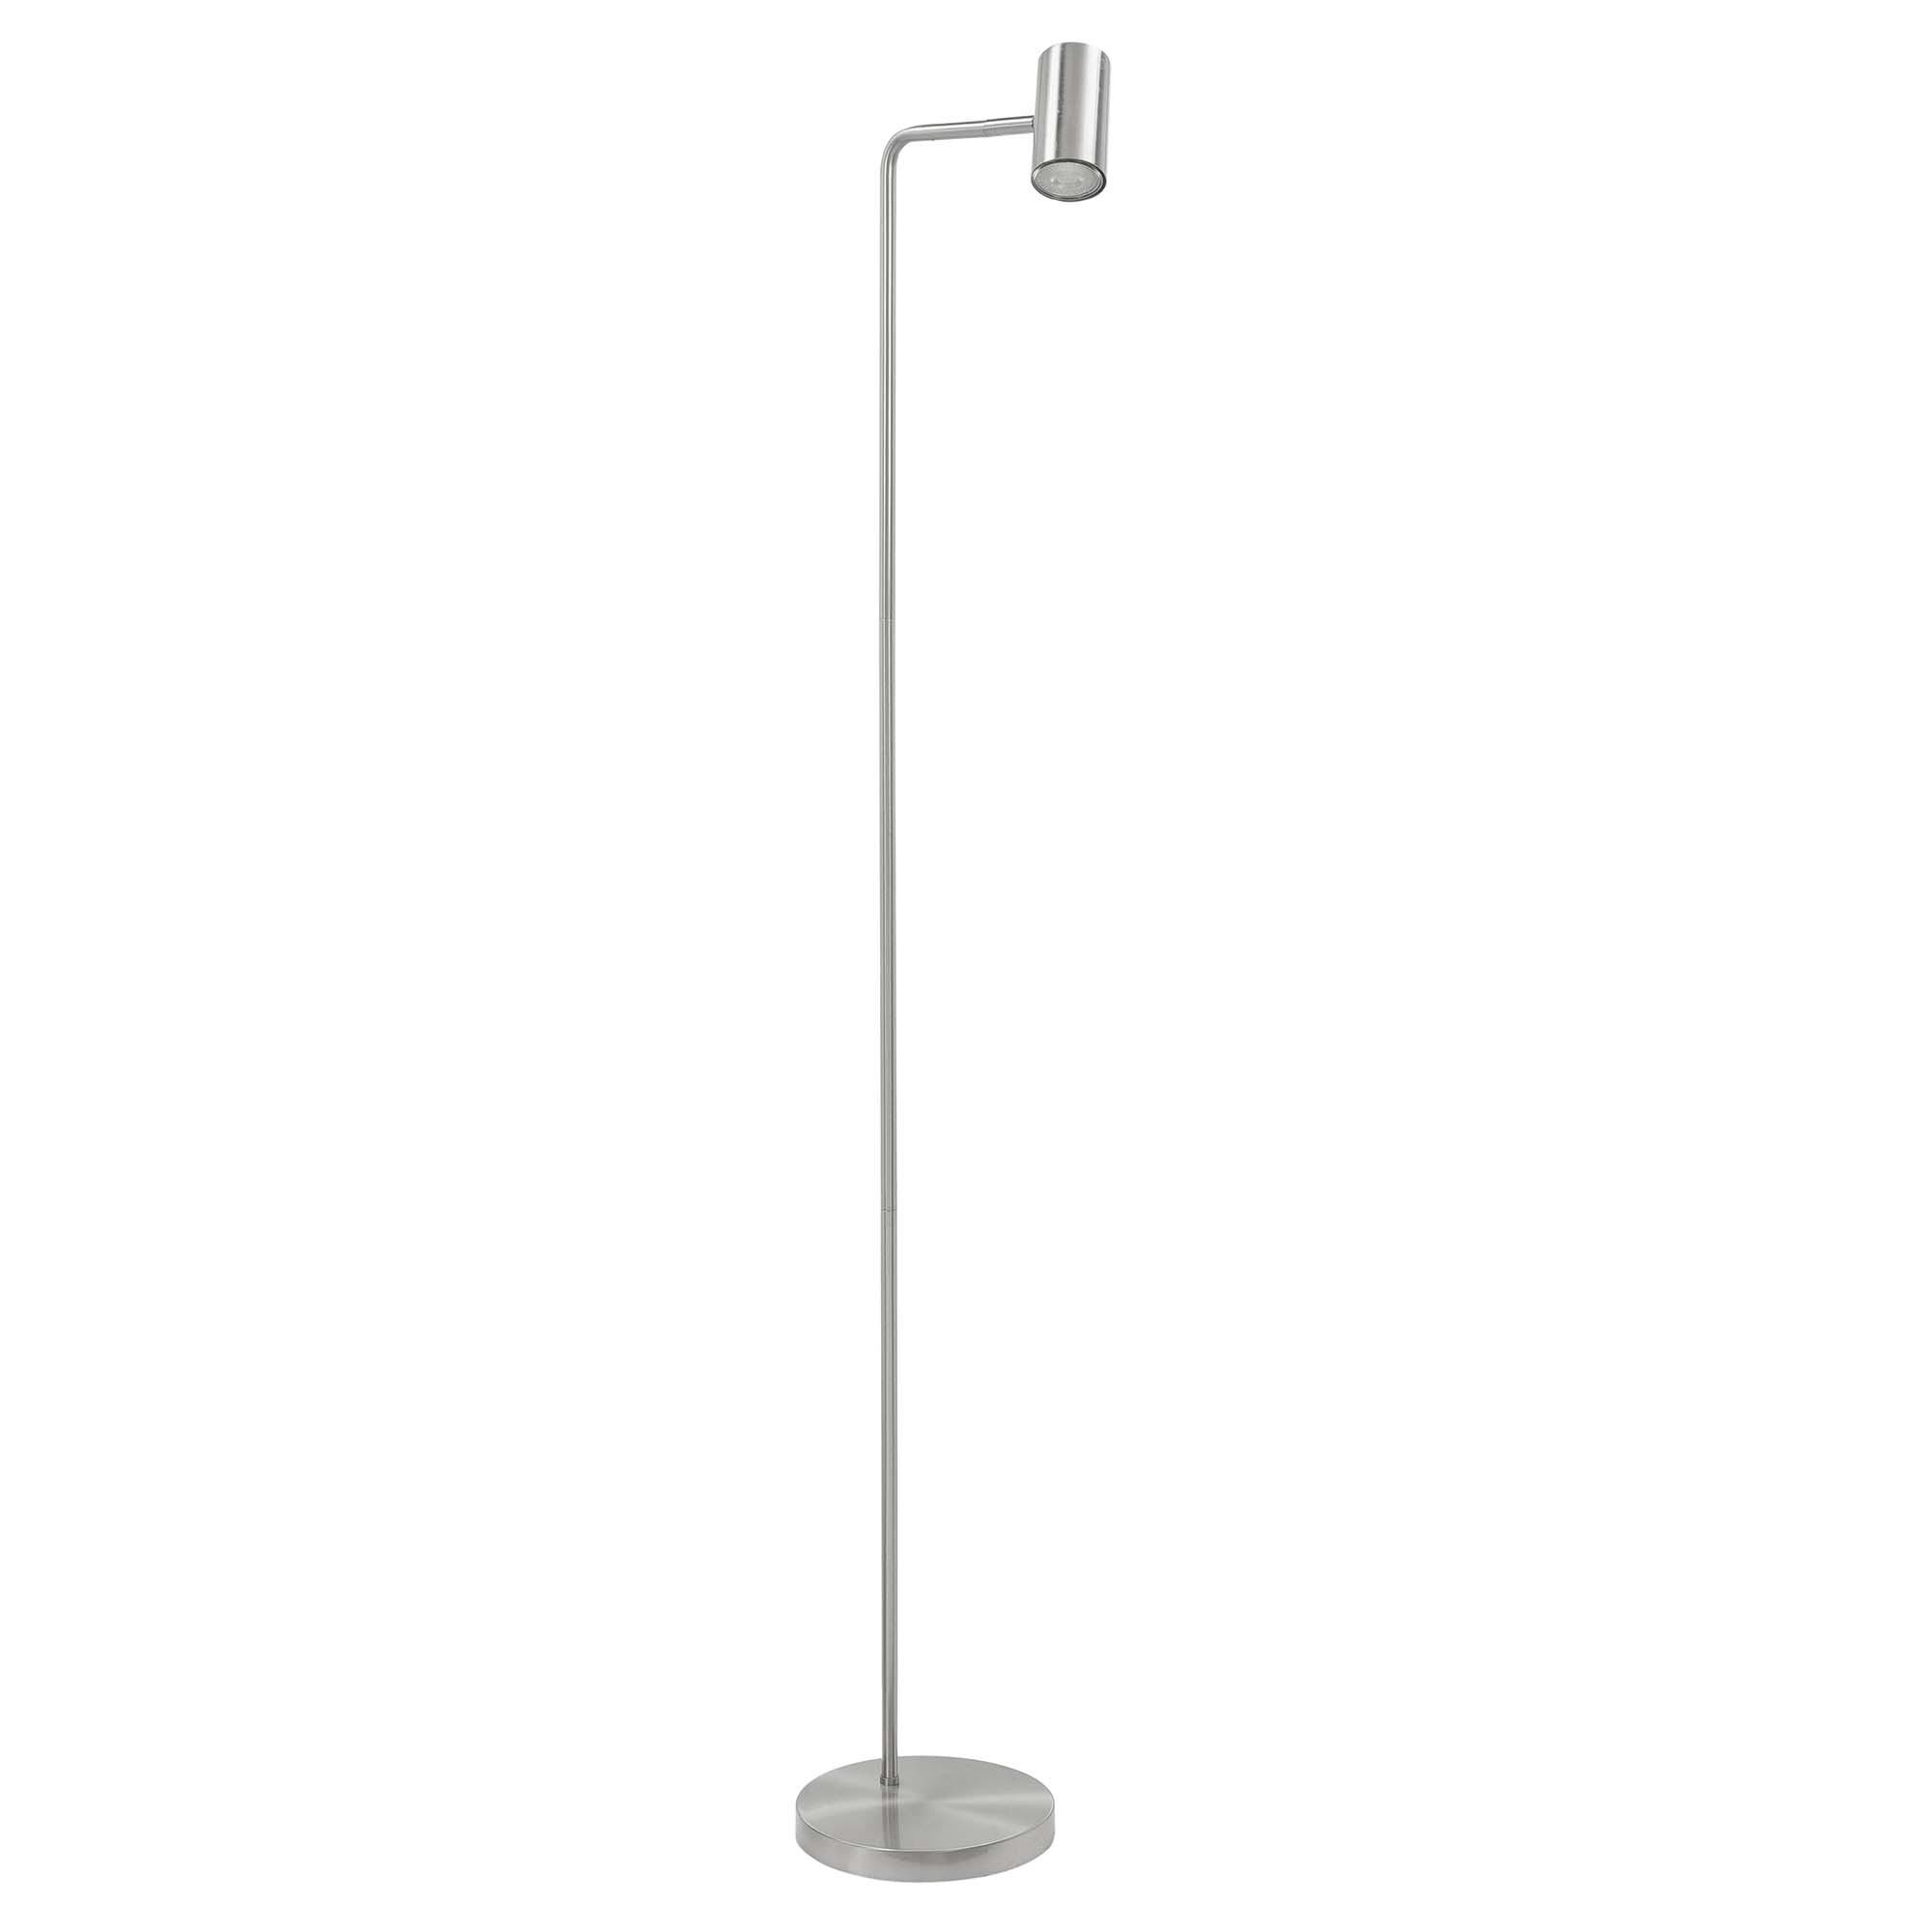 Ylumen Vloerlamp Burgos 1 lichts H 134 cm mat chroom